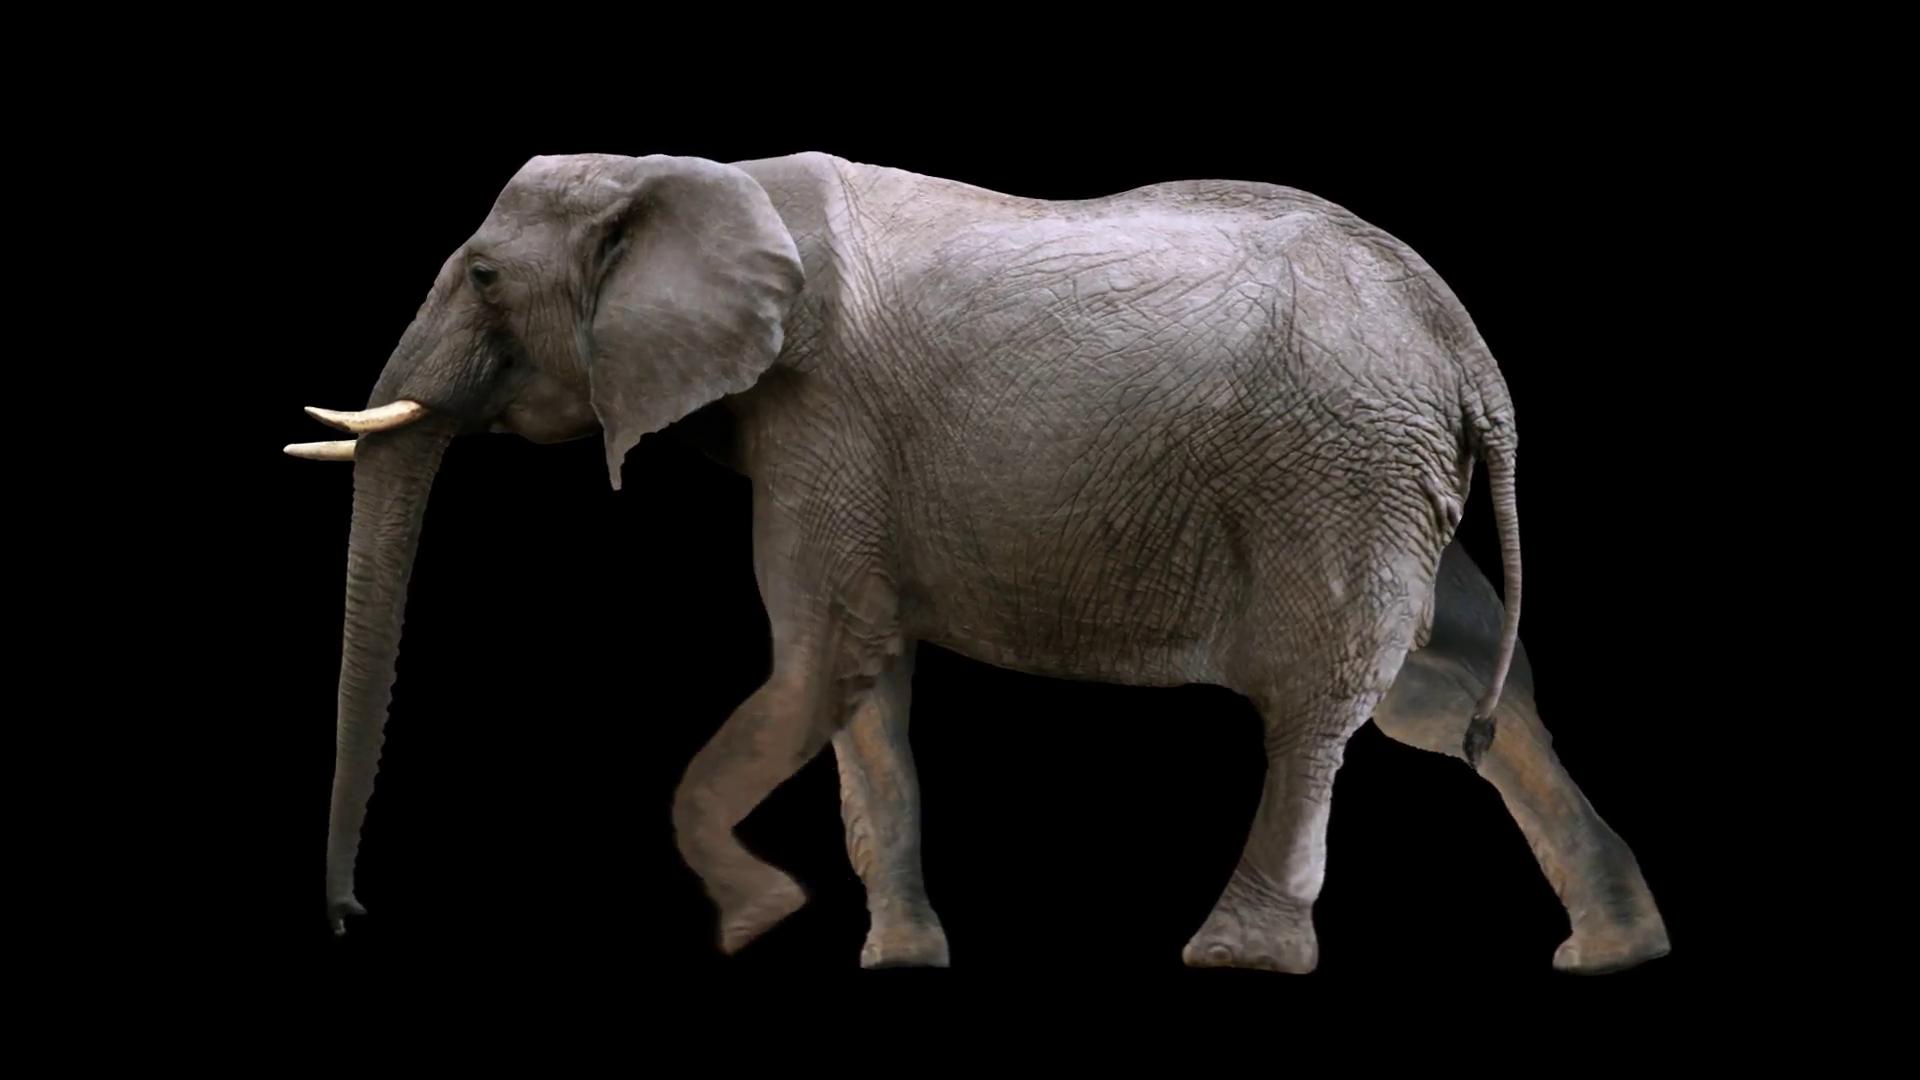 Elephant Walking loop Motion Background - Videoblocks